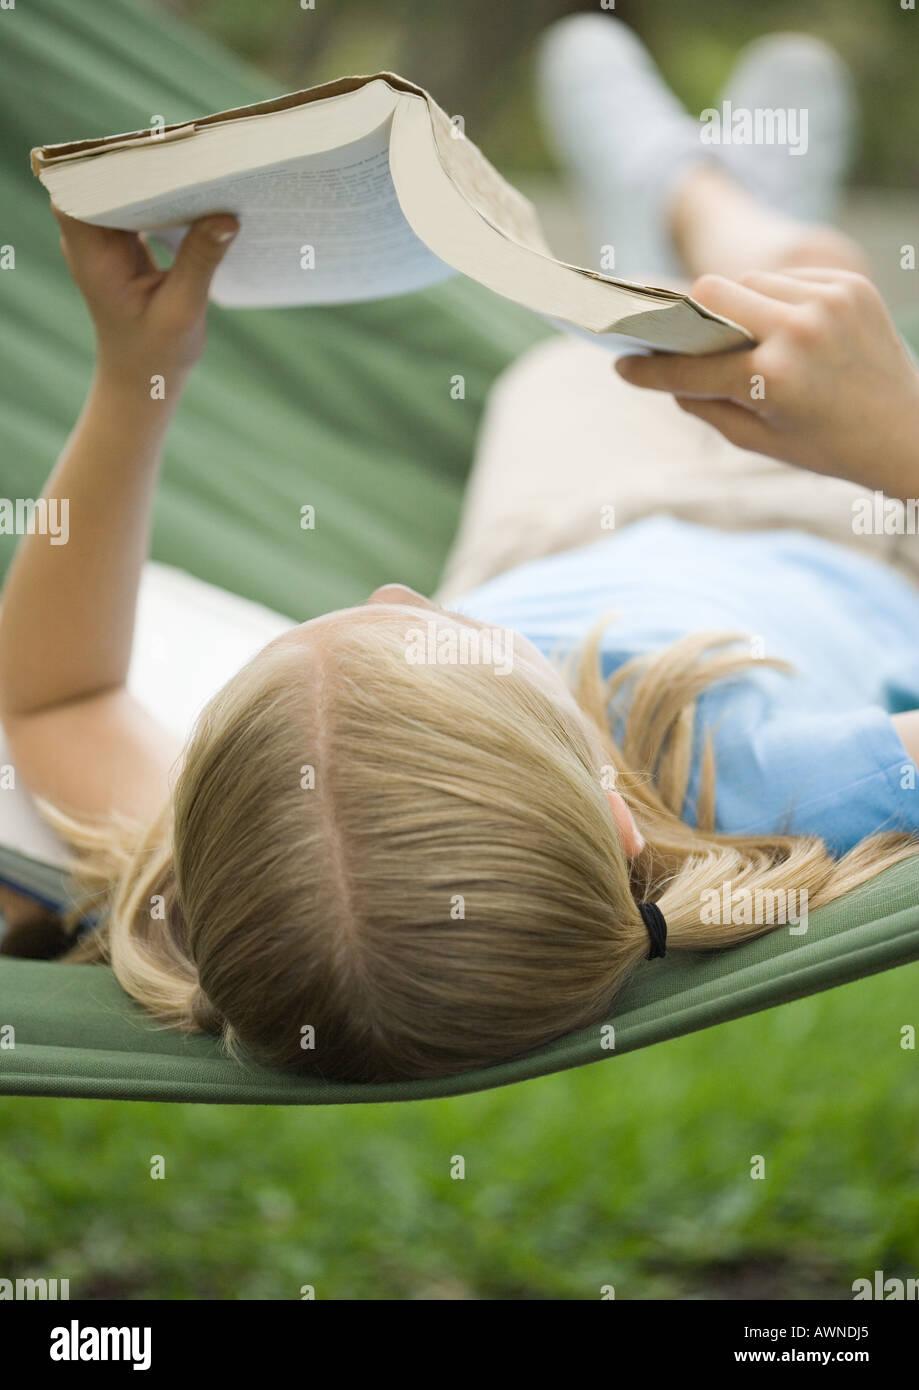 Girl reading book on hammock - Stock Image